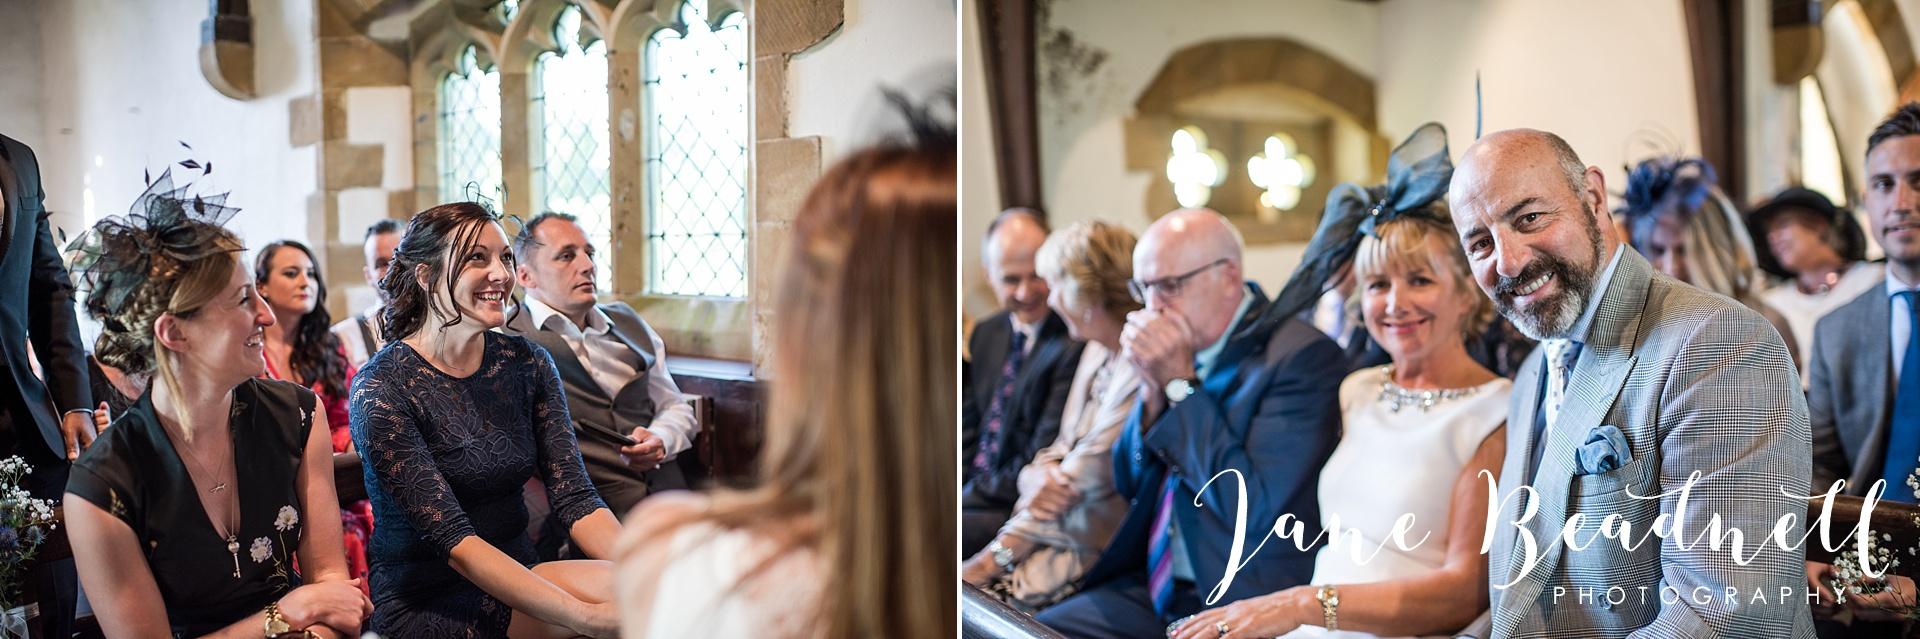 fine-art-wedding-photographer-jane-beadnell-yorkshire-wedding-photographer_0038